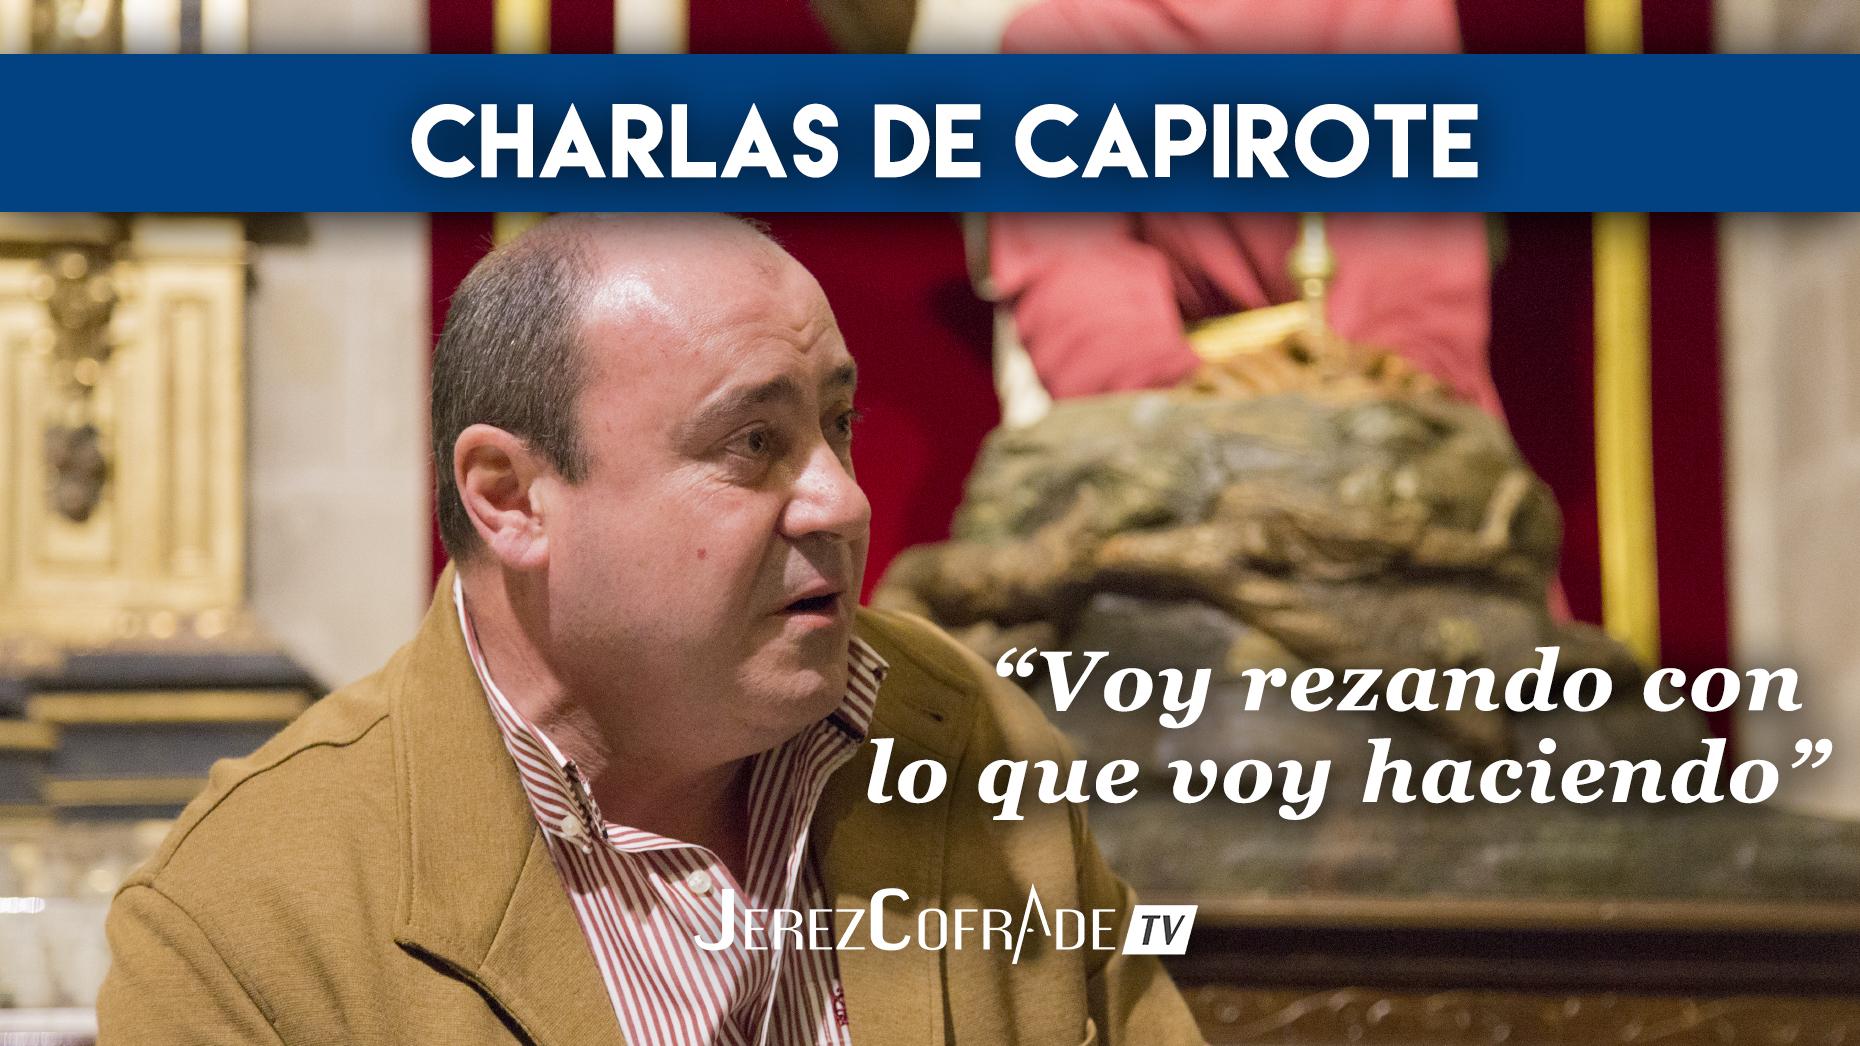 CharlasCapiroteMiniaturafacebook